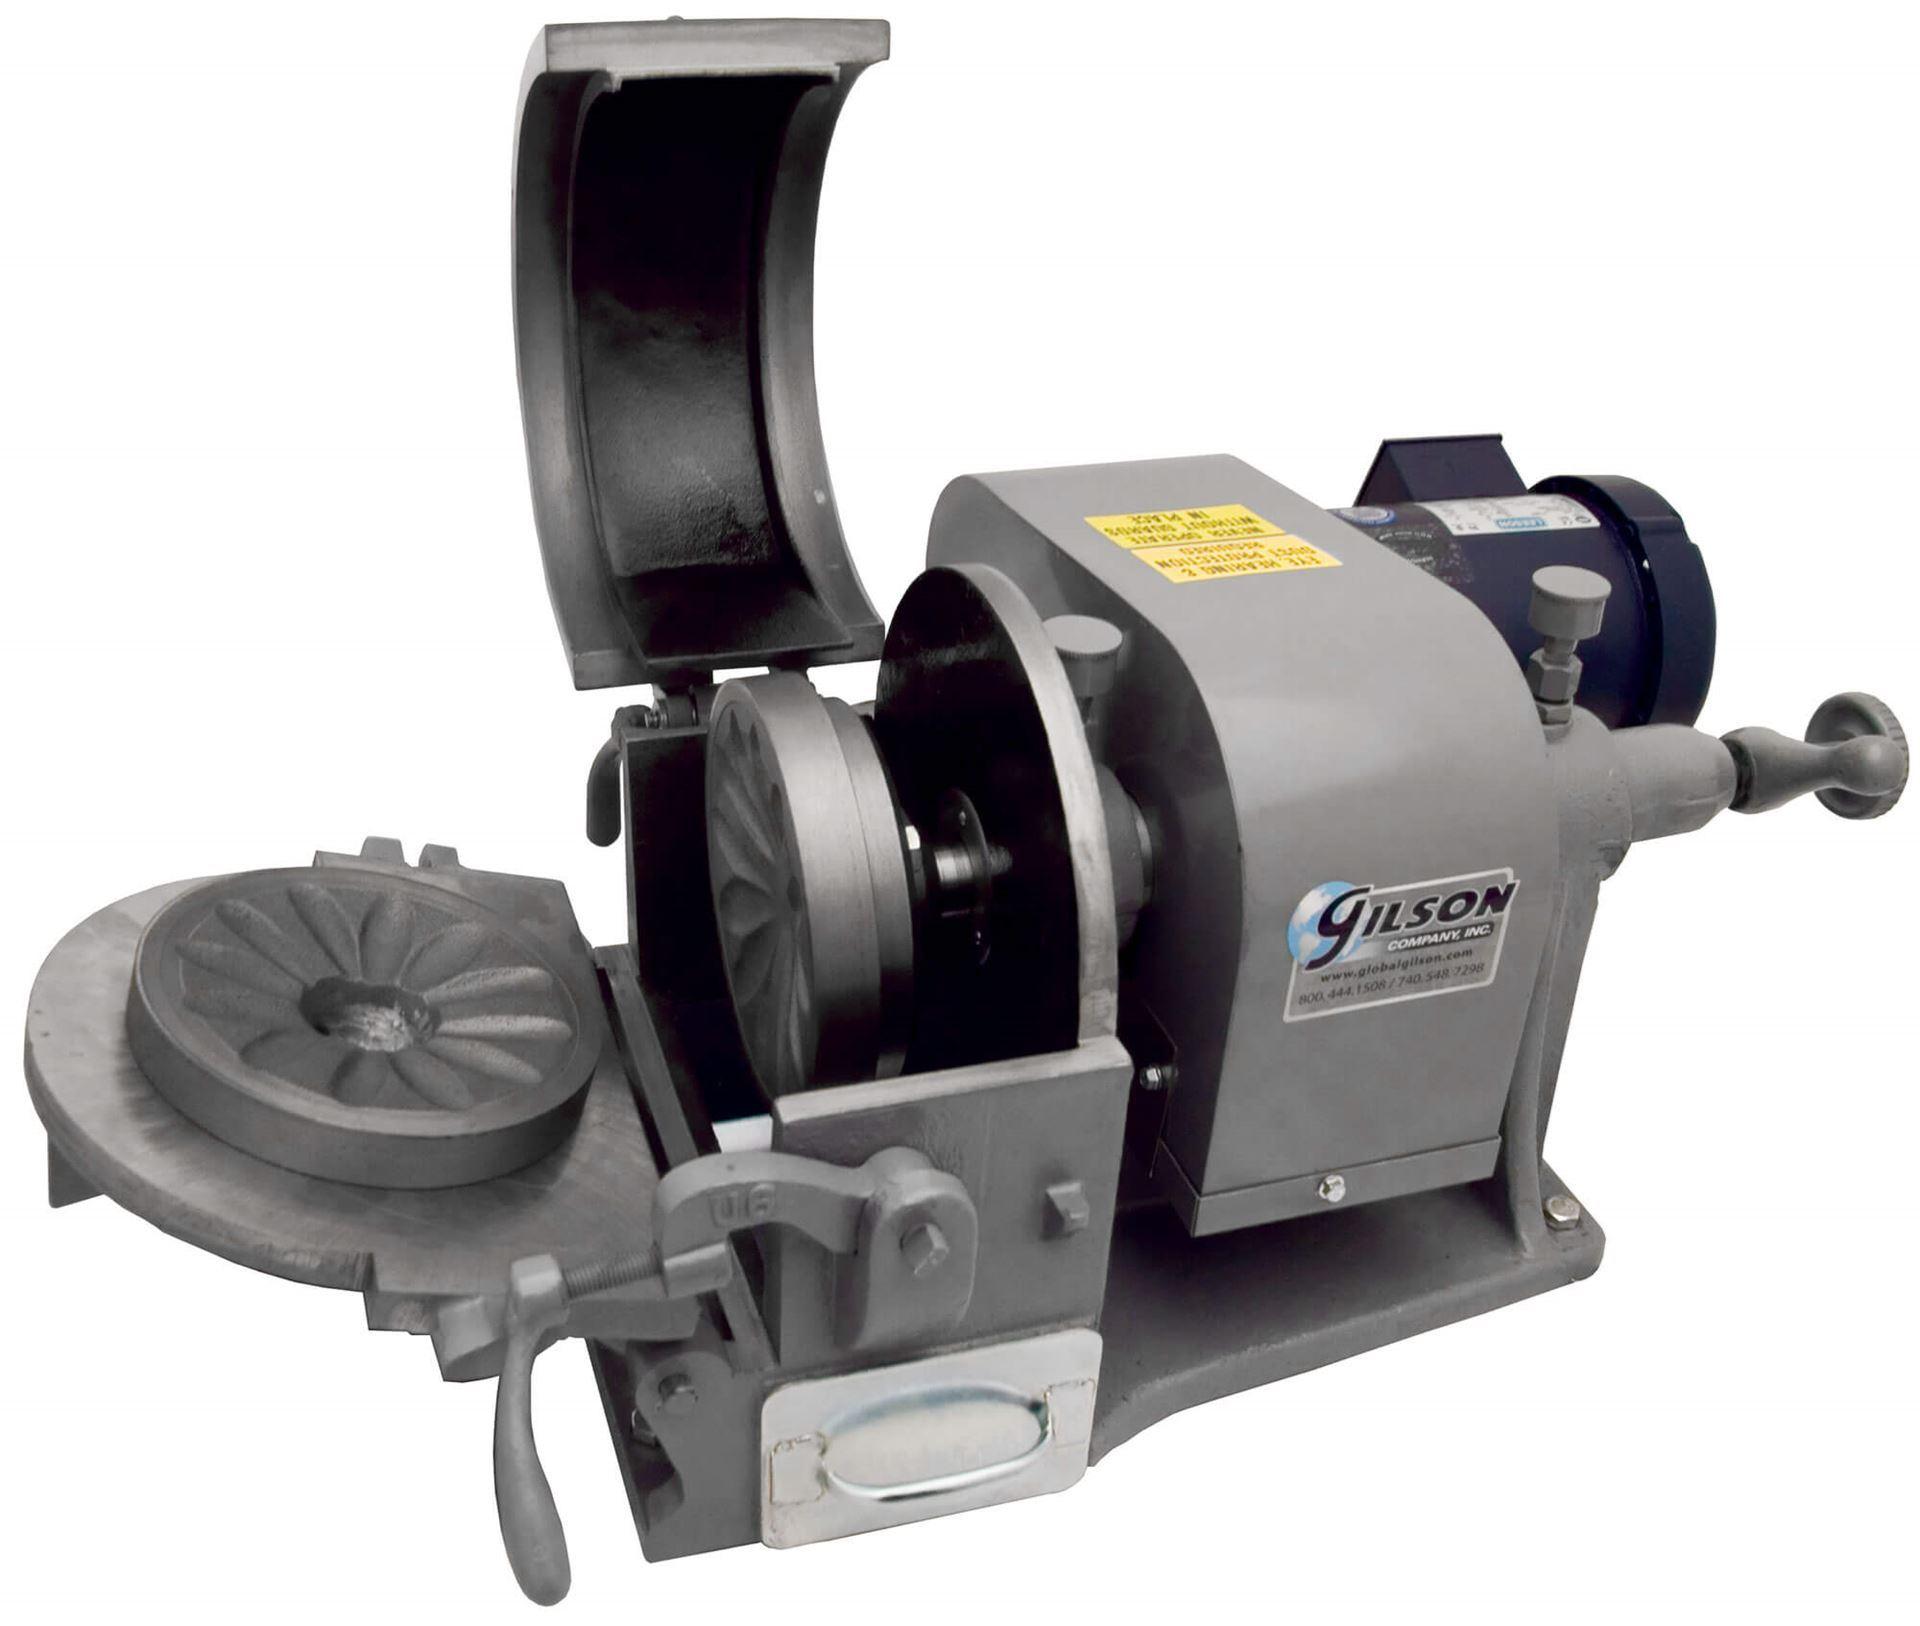 Minimal Design Bico Pulverizer Gilson Co